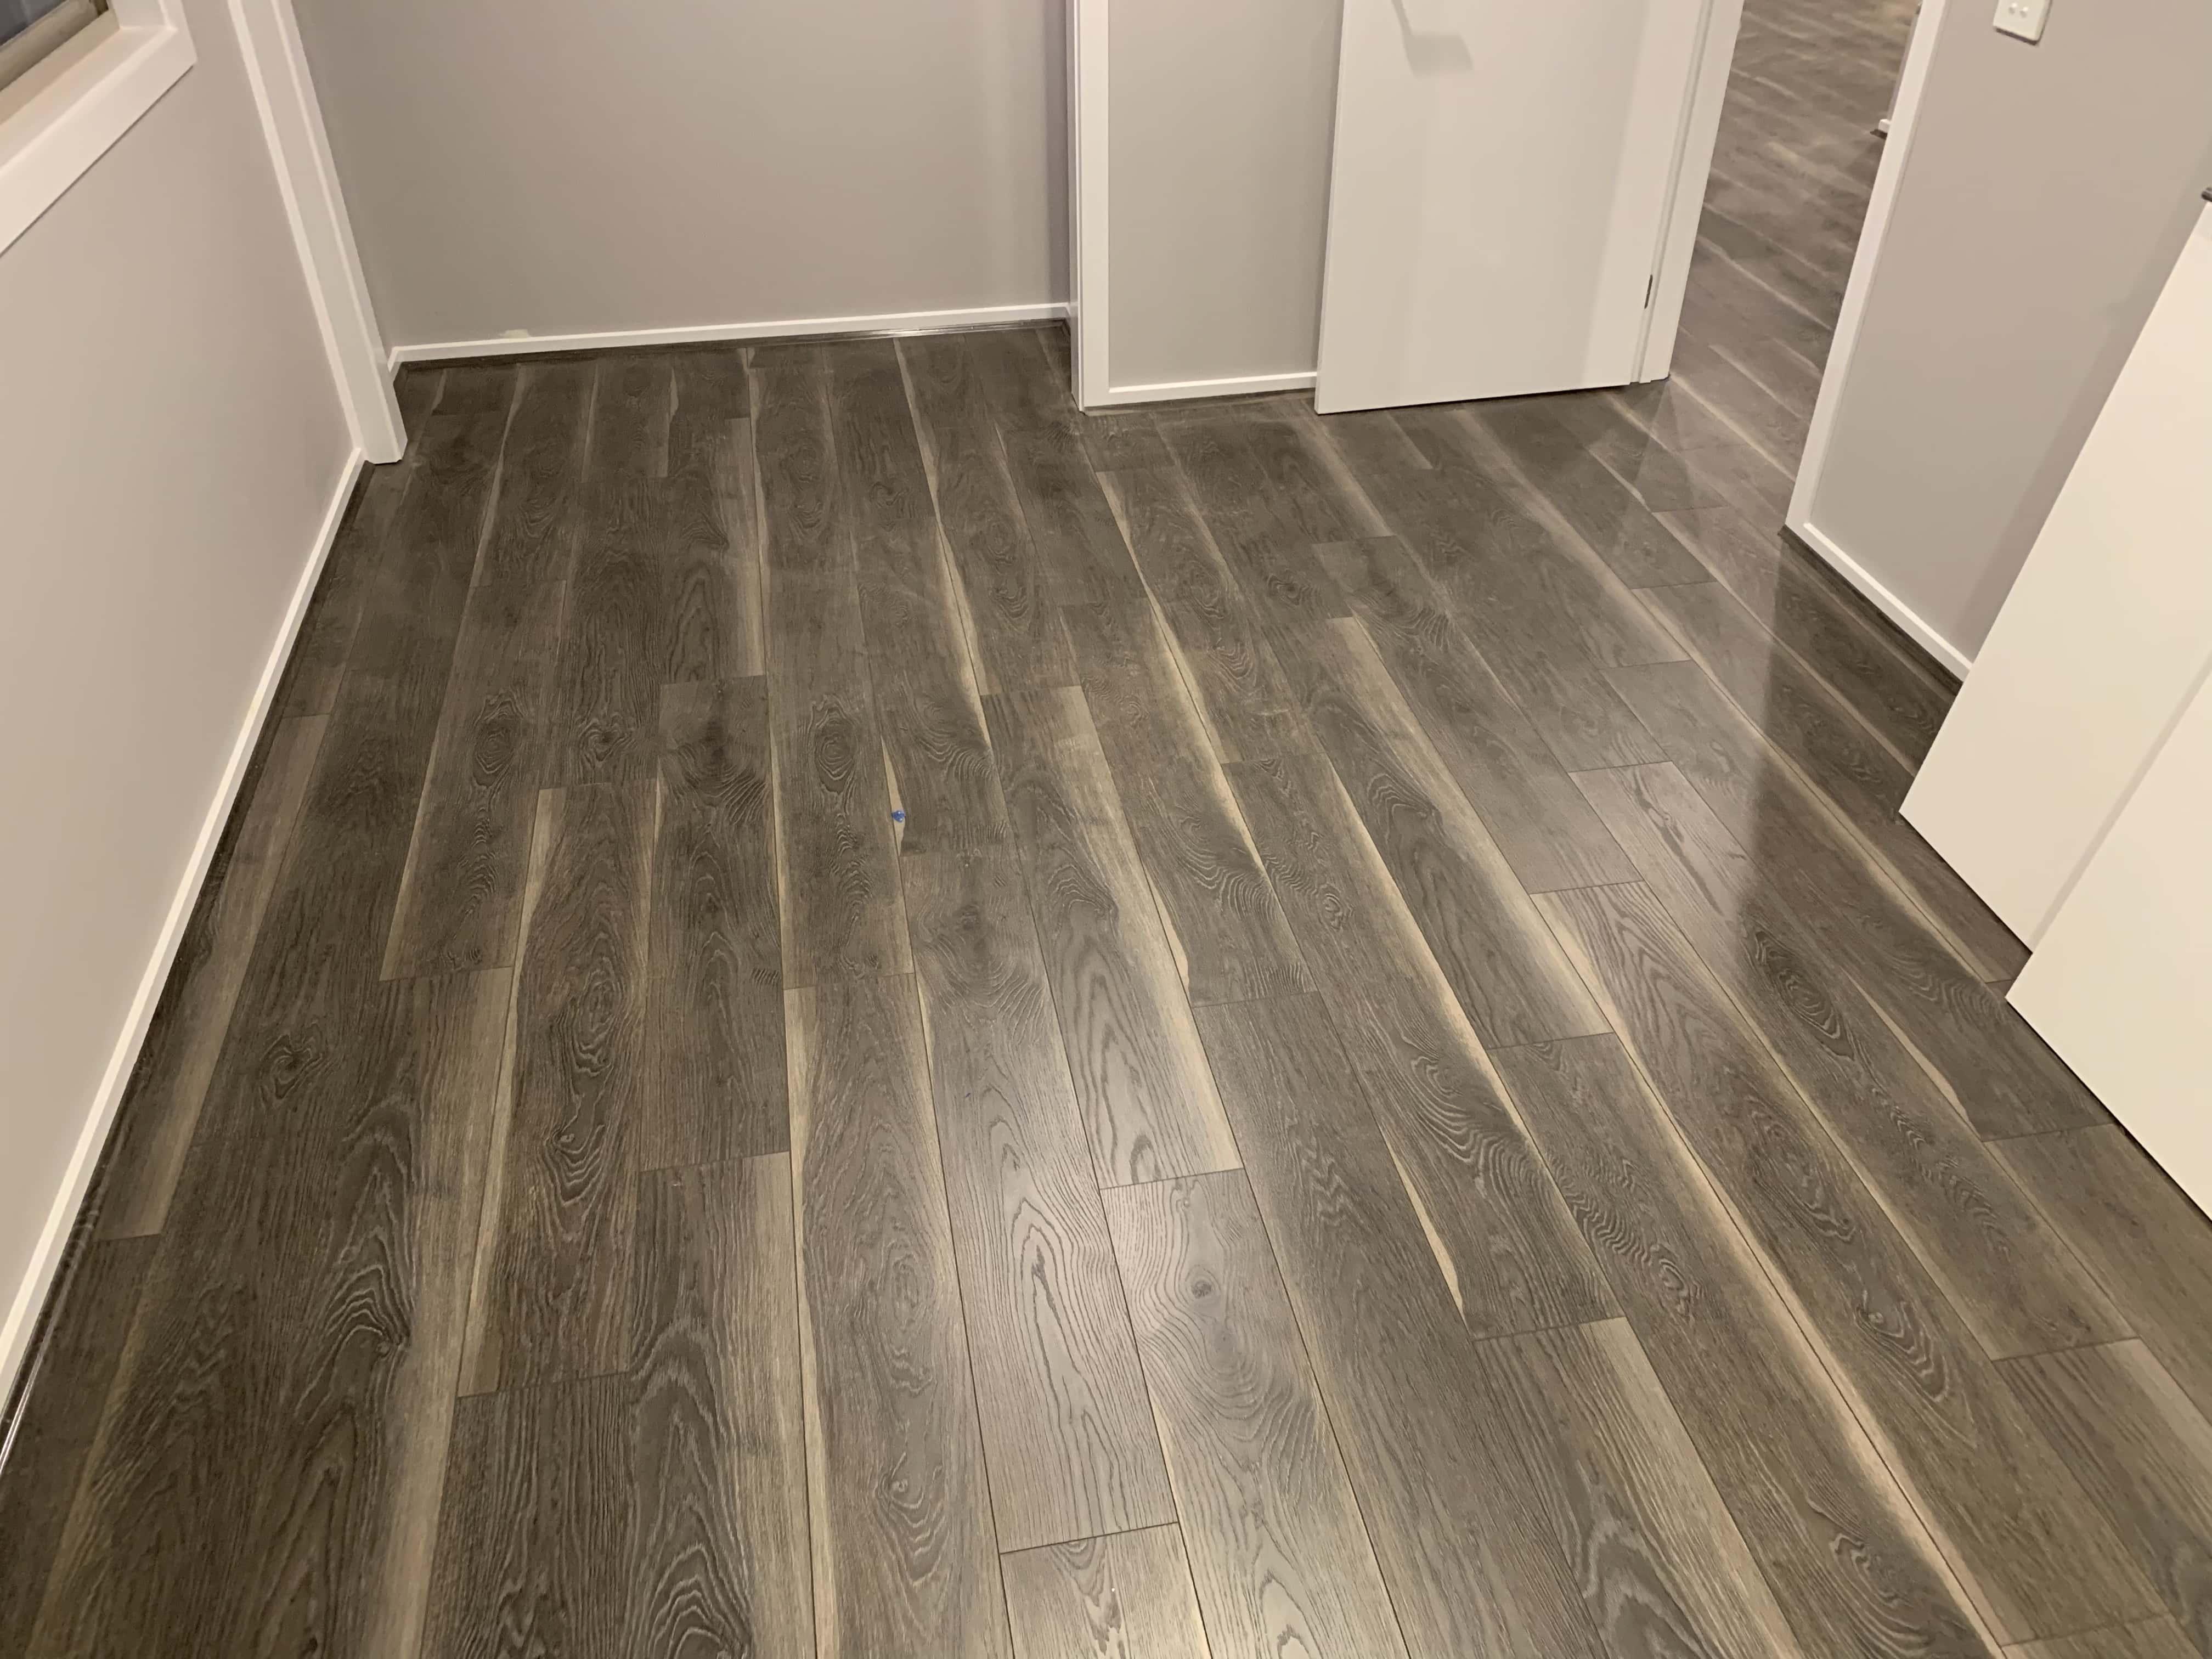 Dark Laminate Flooring 1215x195x12mm